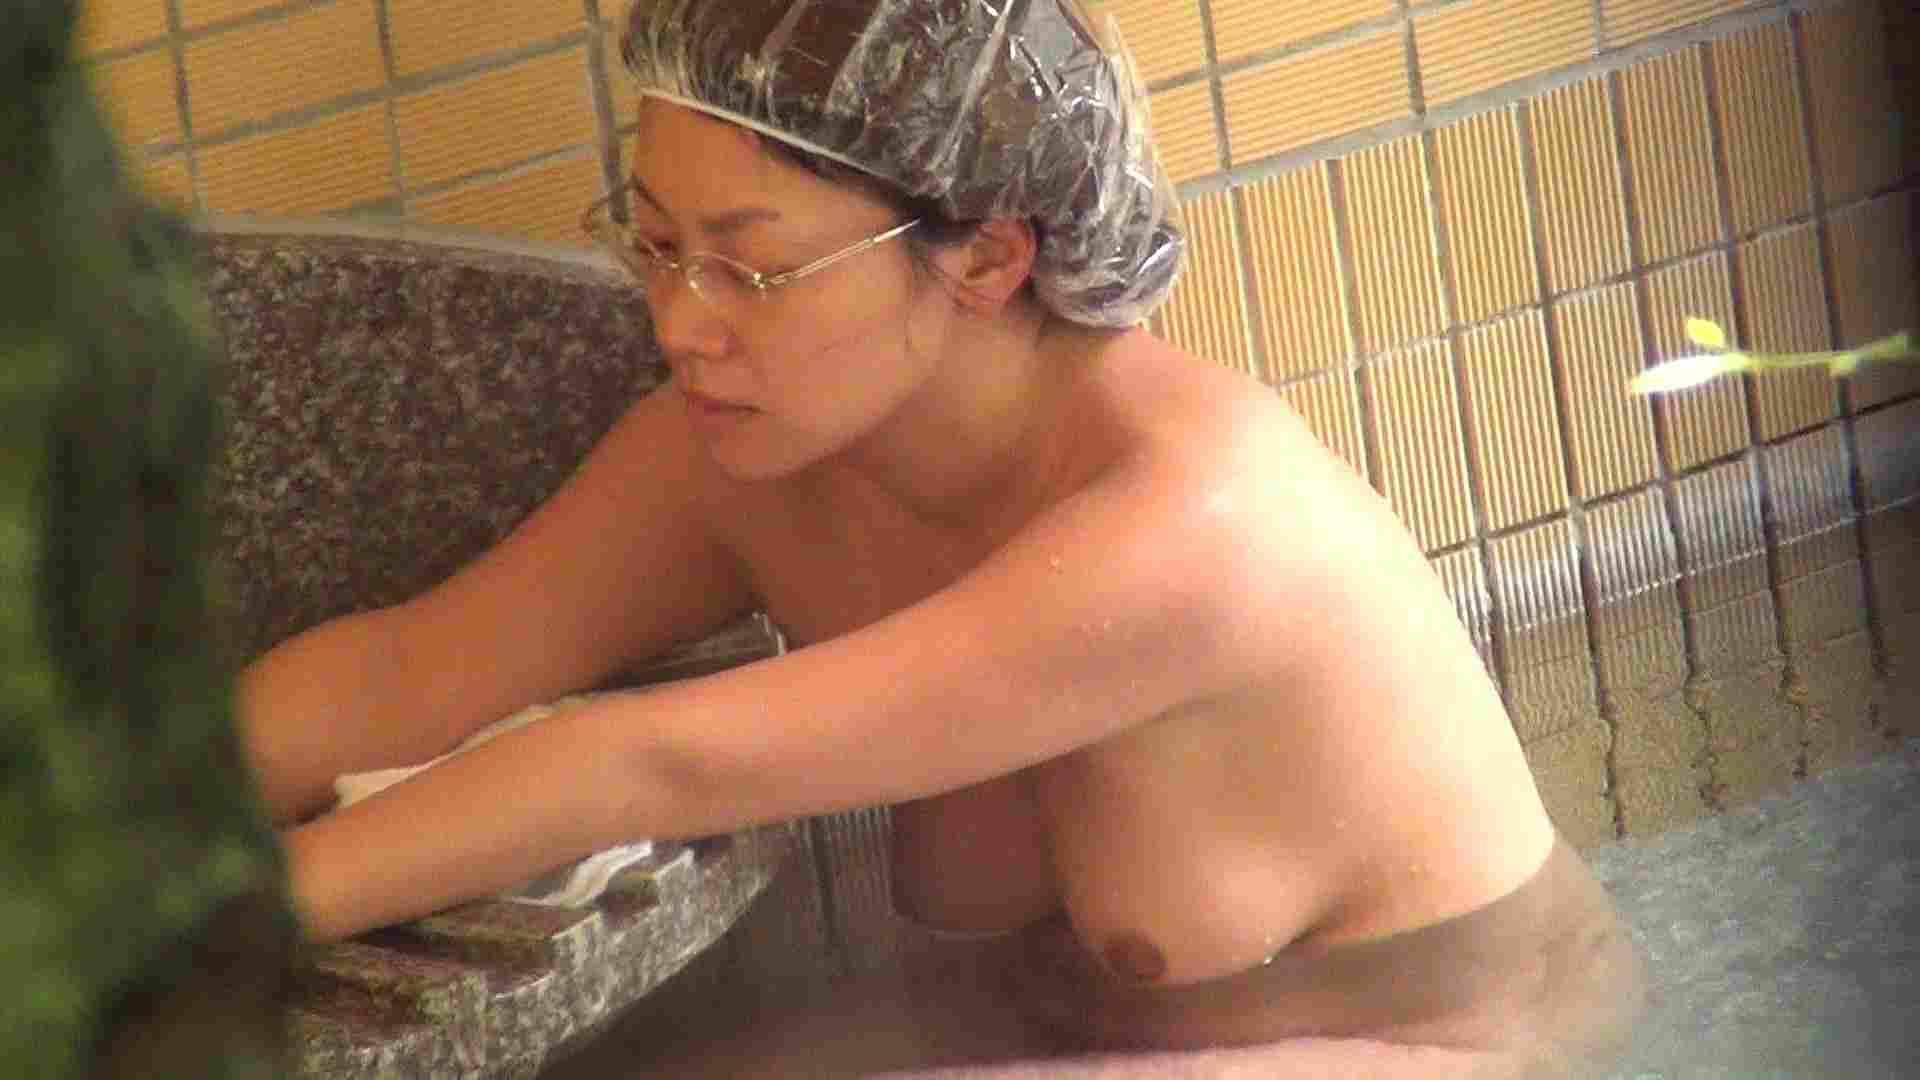 Aquaな露天風呂Vol.280 盗撮師作品  100pic 18